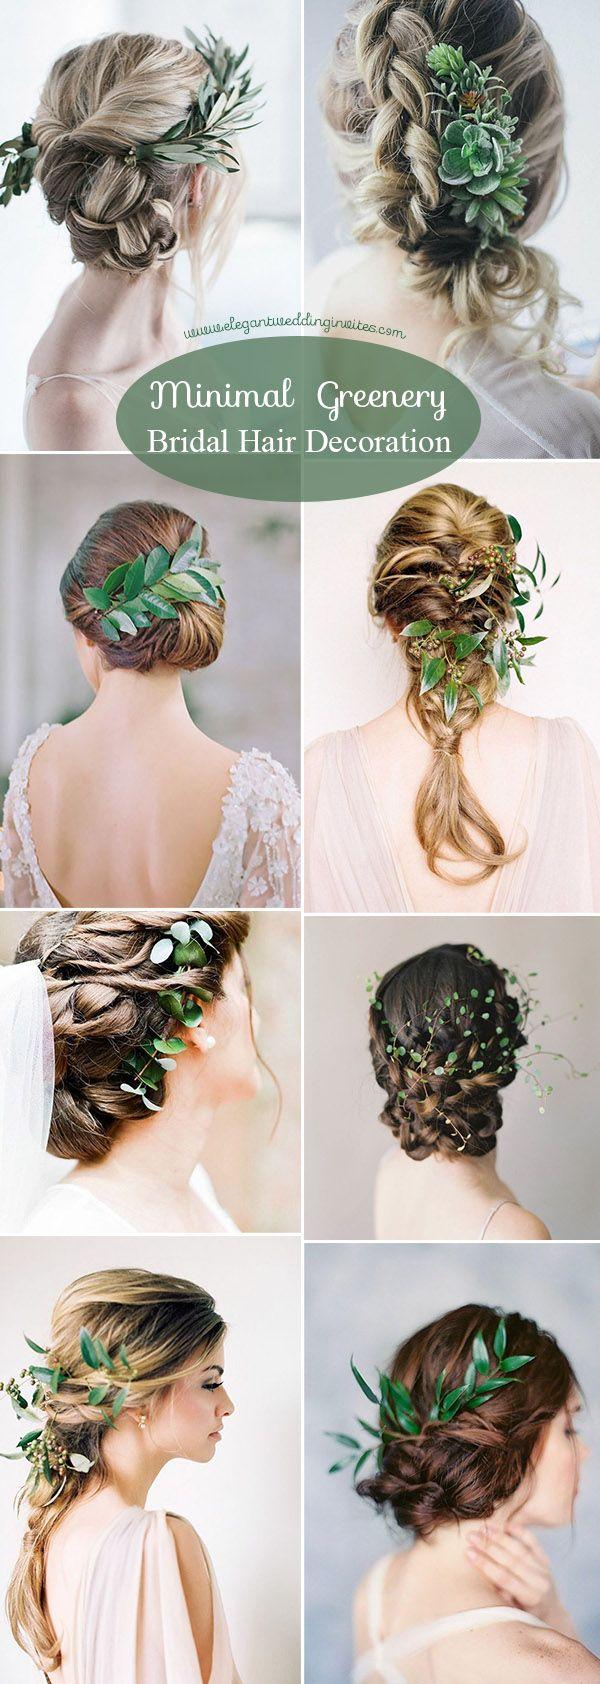 103 best Greenery Wedding images on Pinterest | Dream ...